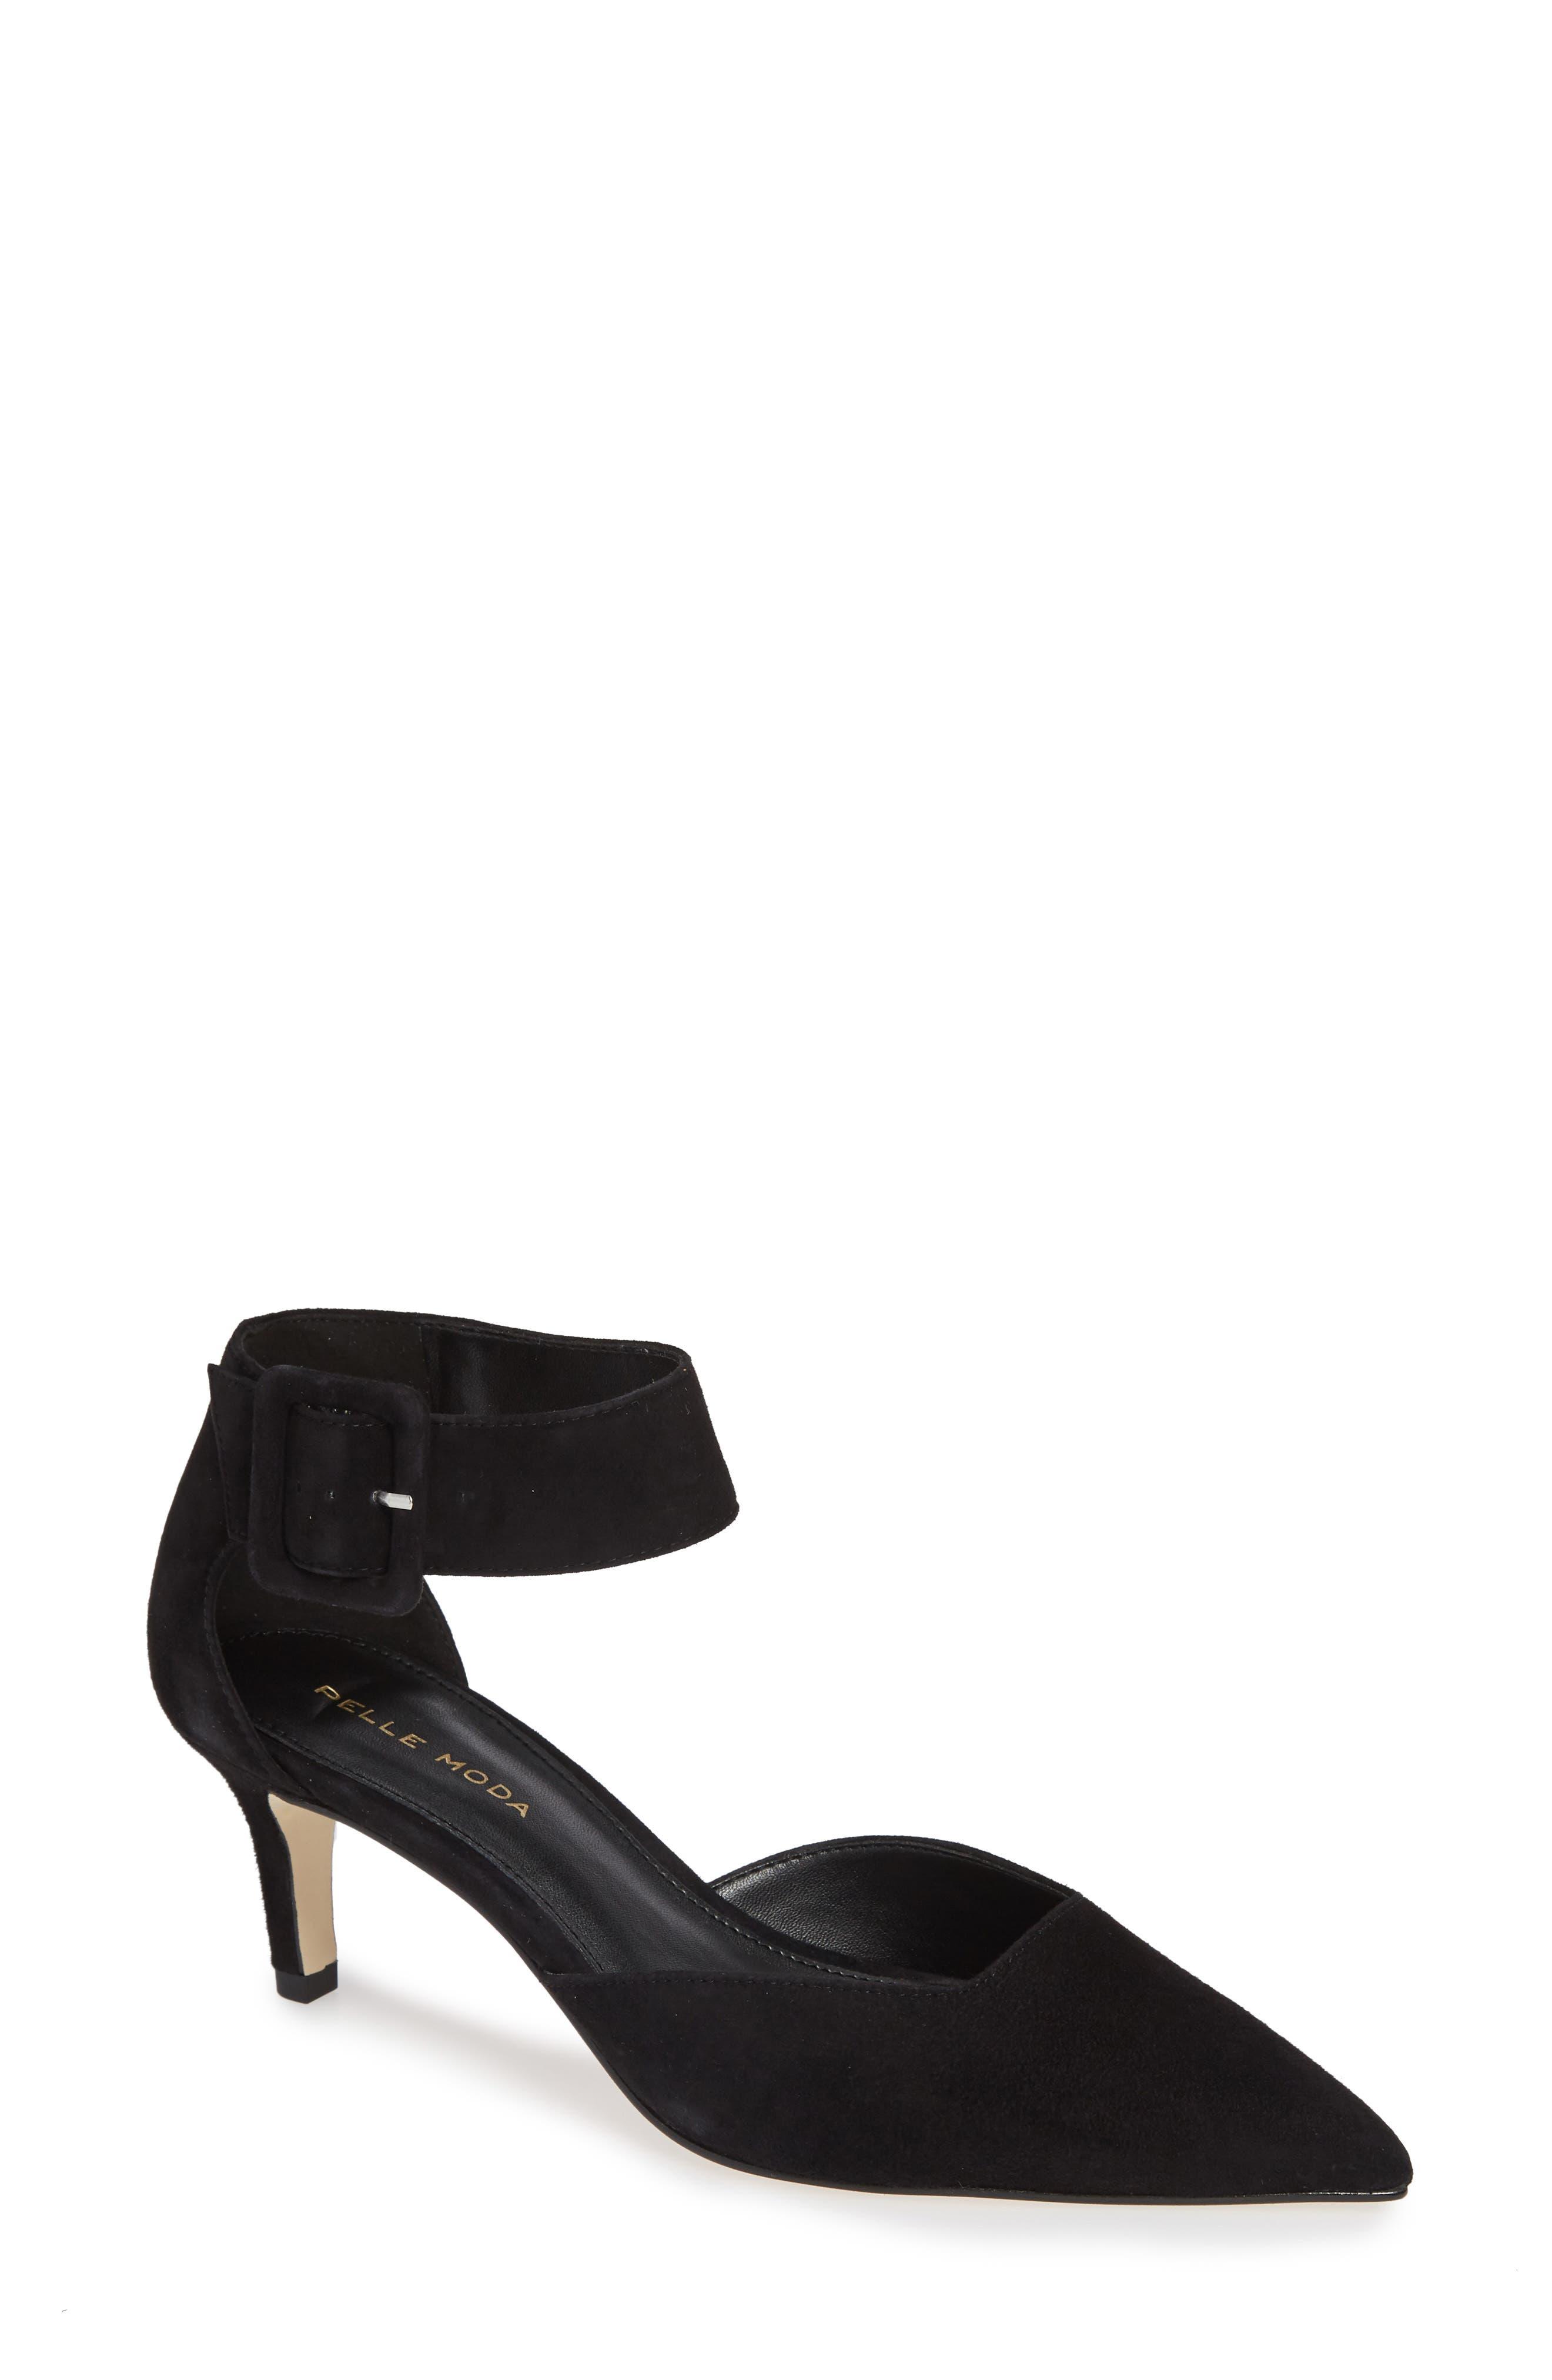 Kenley Ankle Strap Pump,                         Main,                         color, BLACK SUEDE